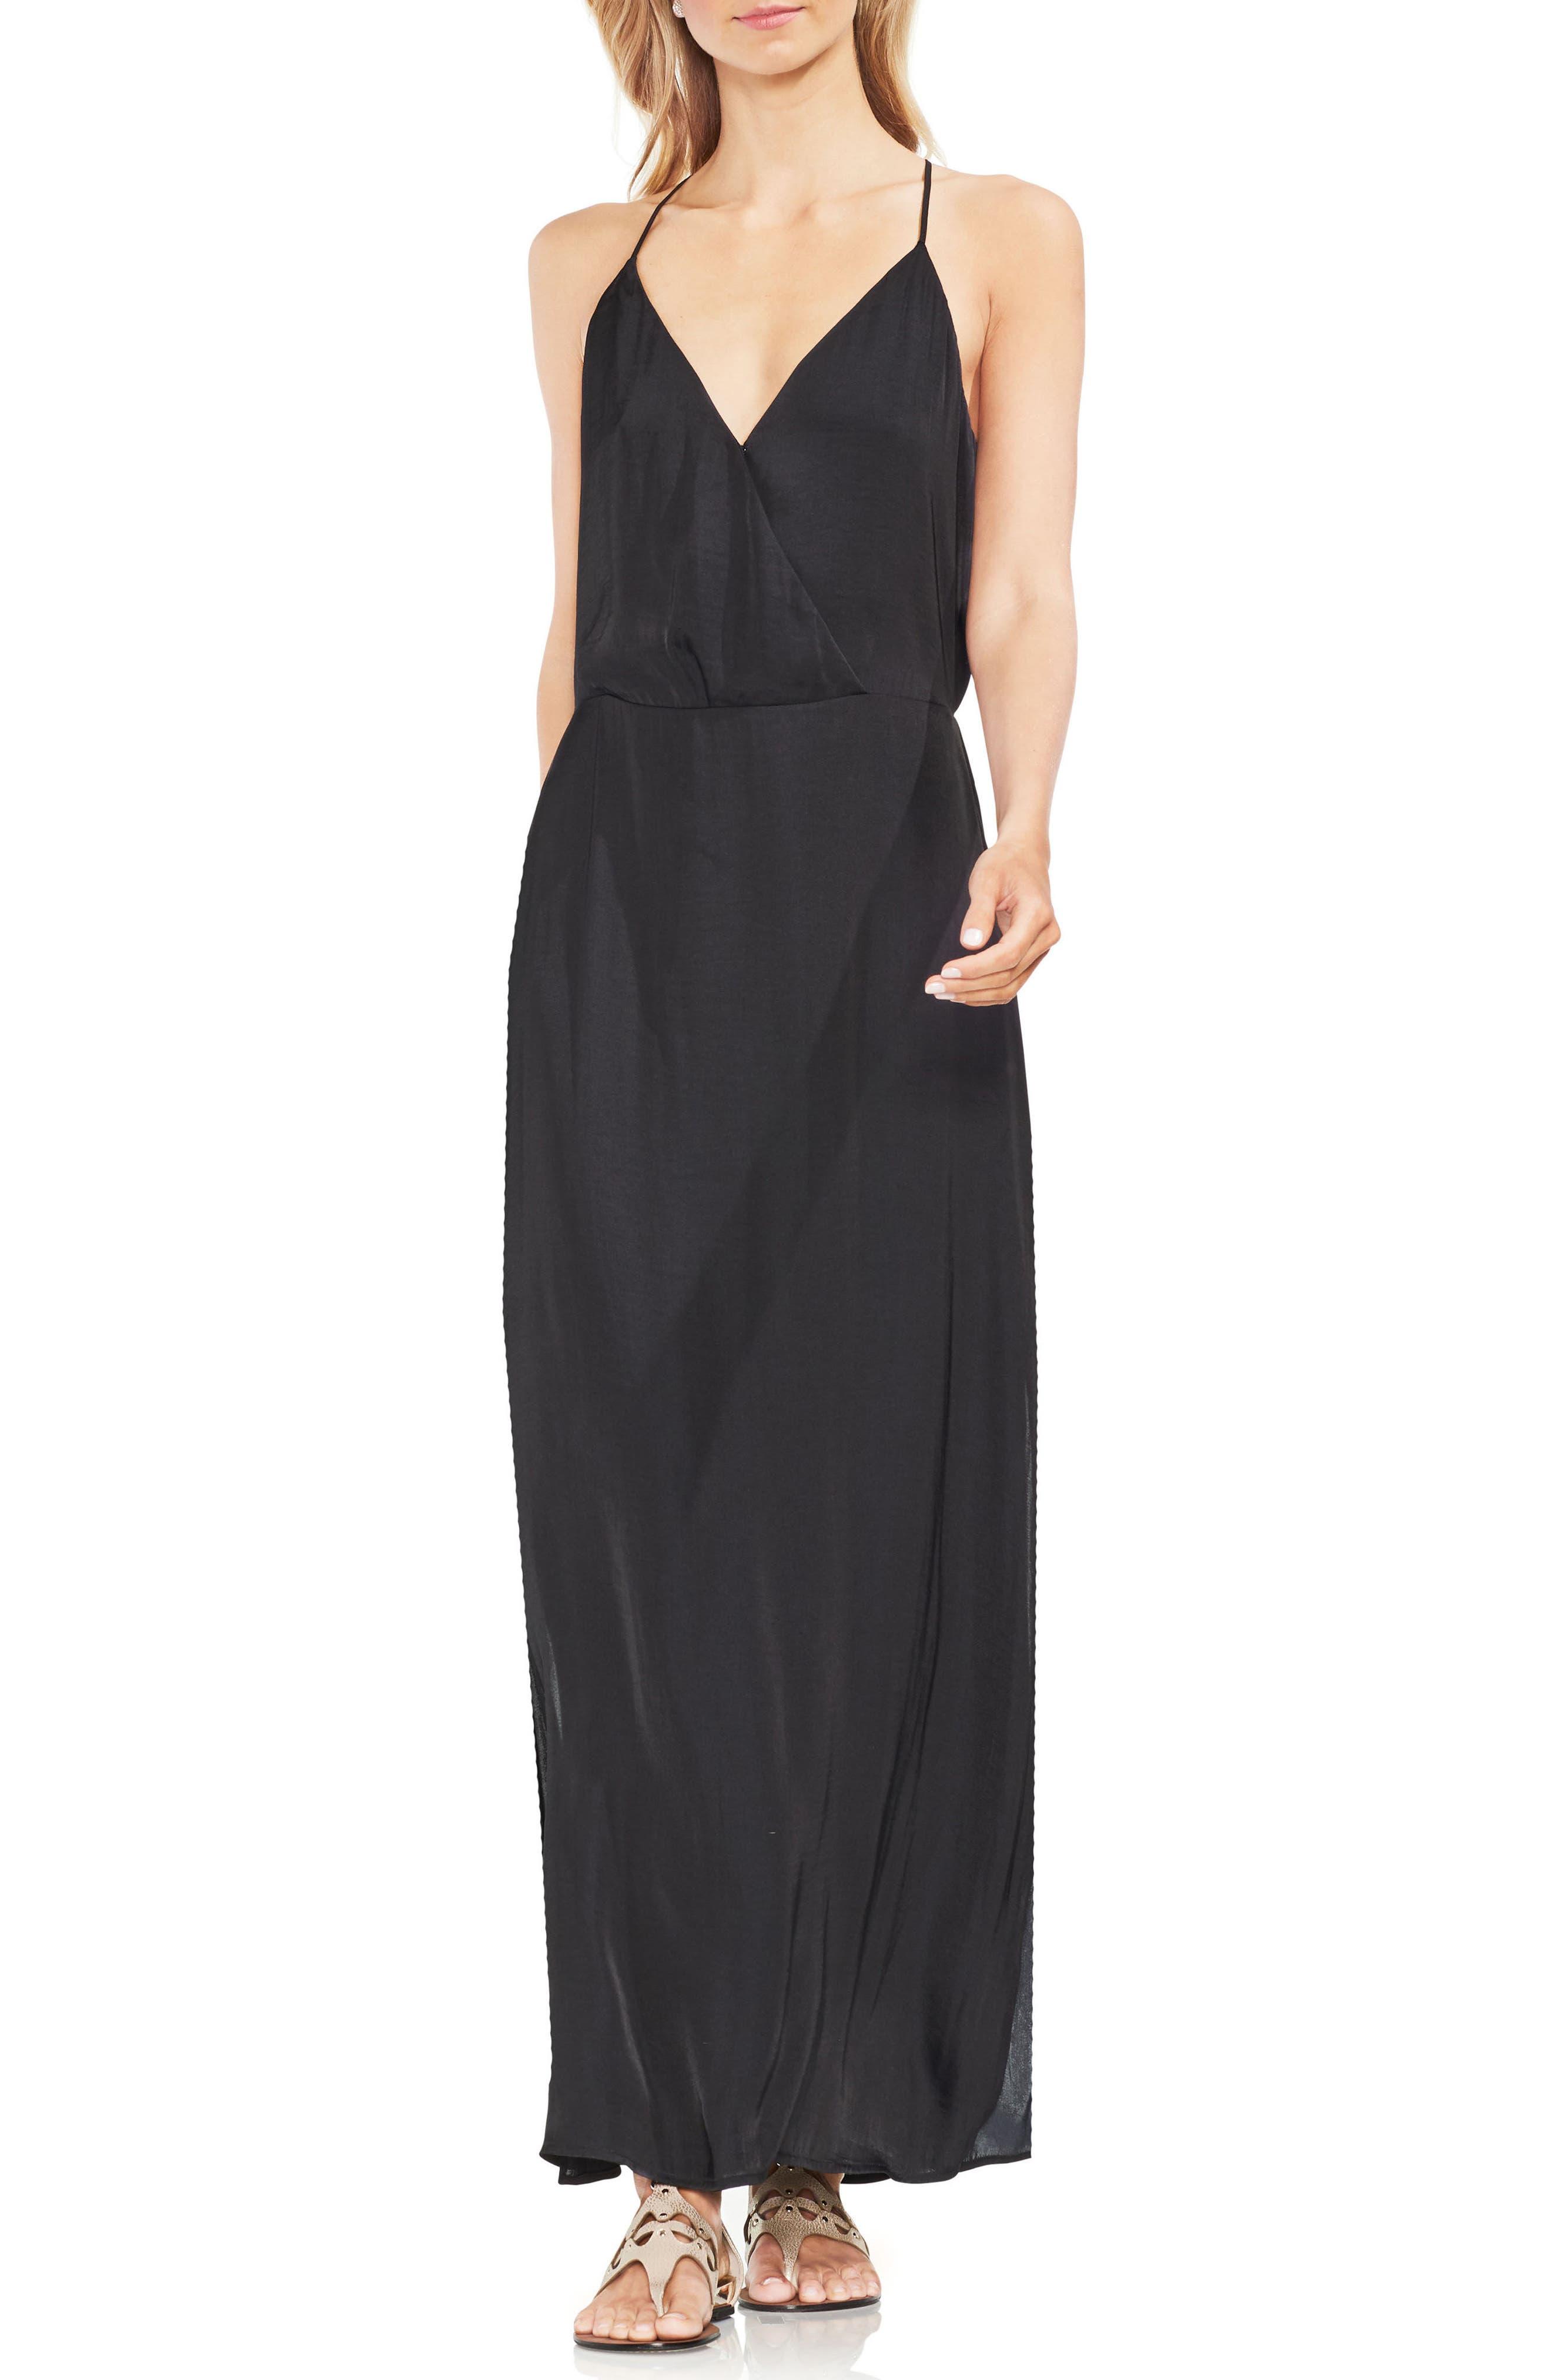 Hammered Satin Wrap Front Maxi Dress,                         Main,                         color, 001